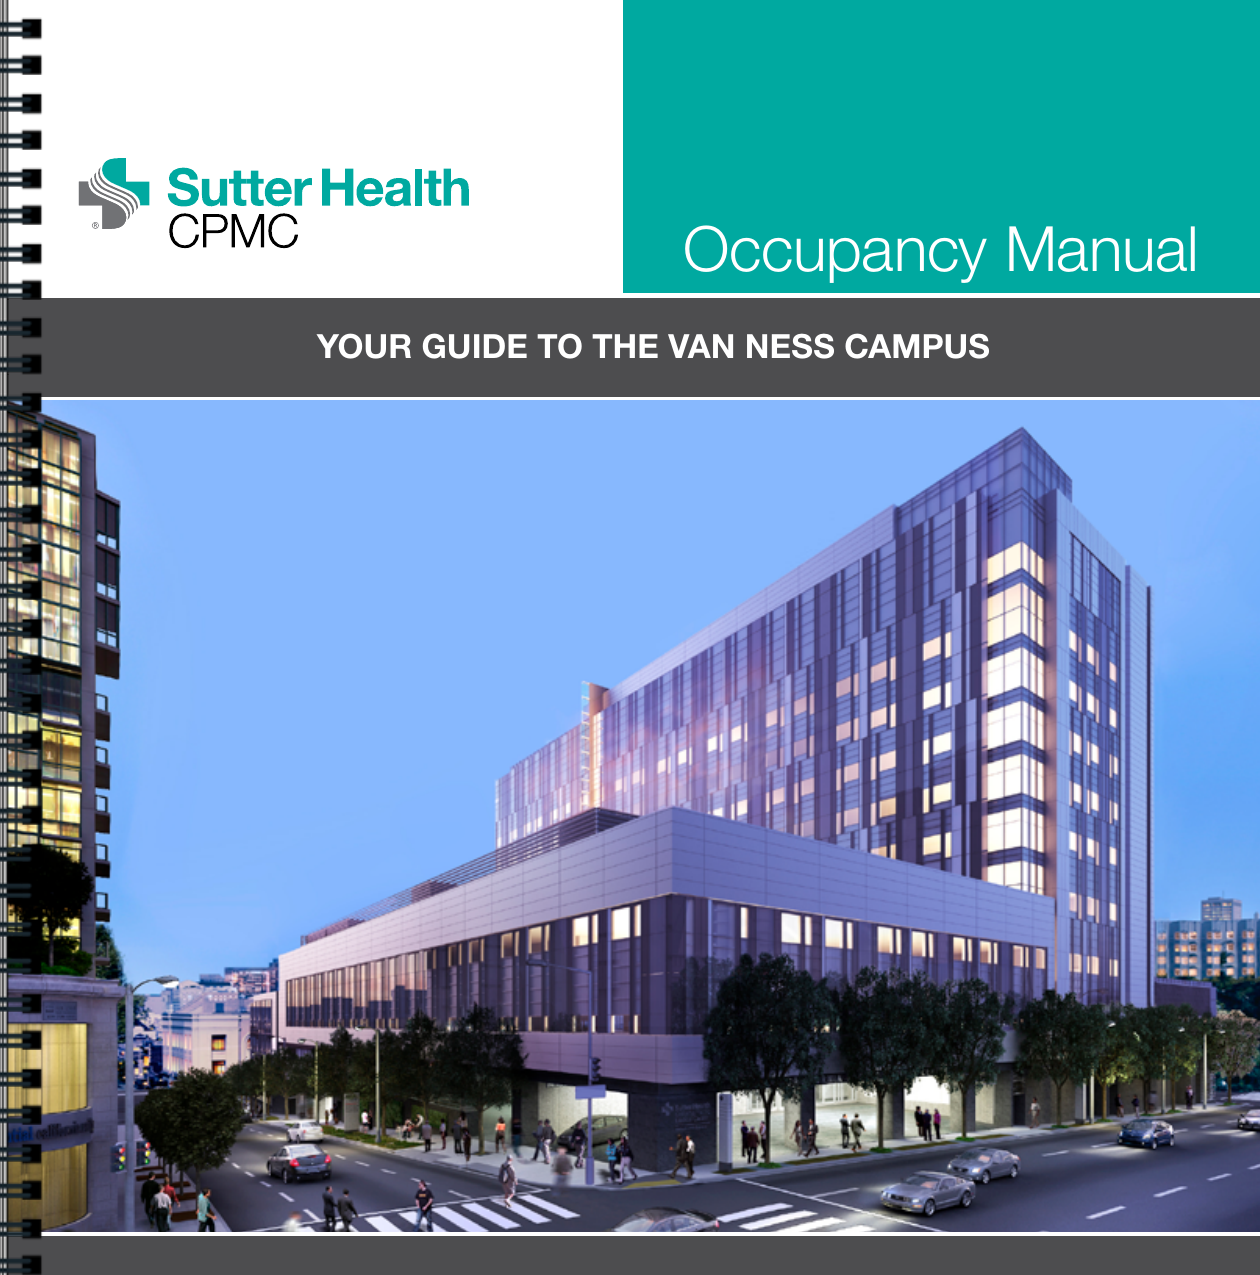 Sutter Health CPMC Van Ness Hospital Occupancy Manual 18